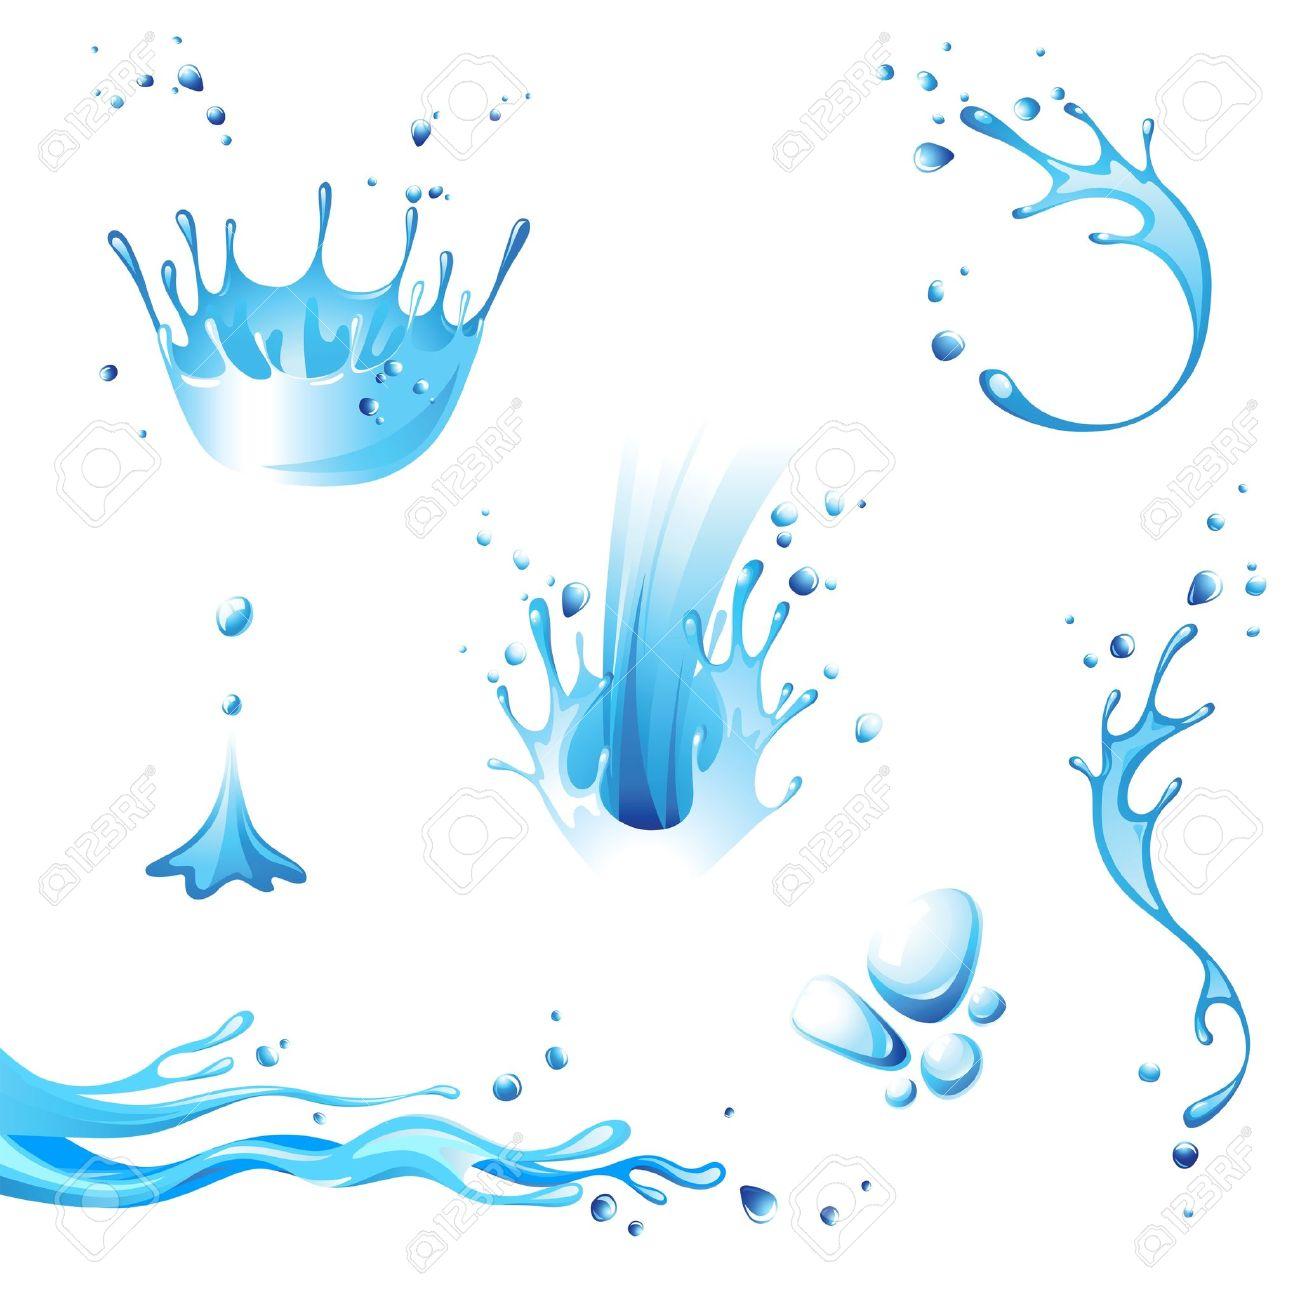 Water splash icons set Stock Vector - 14788988